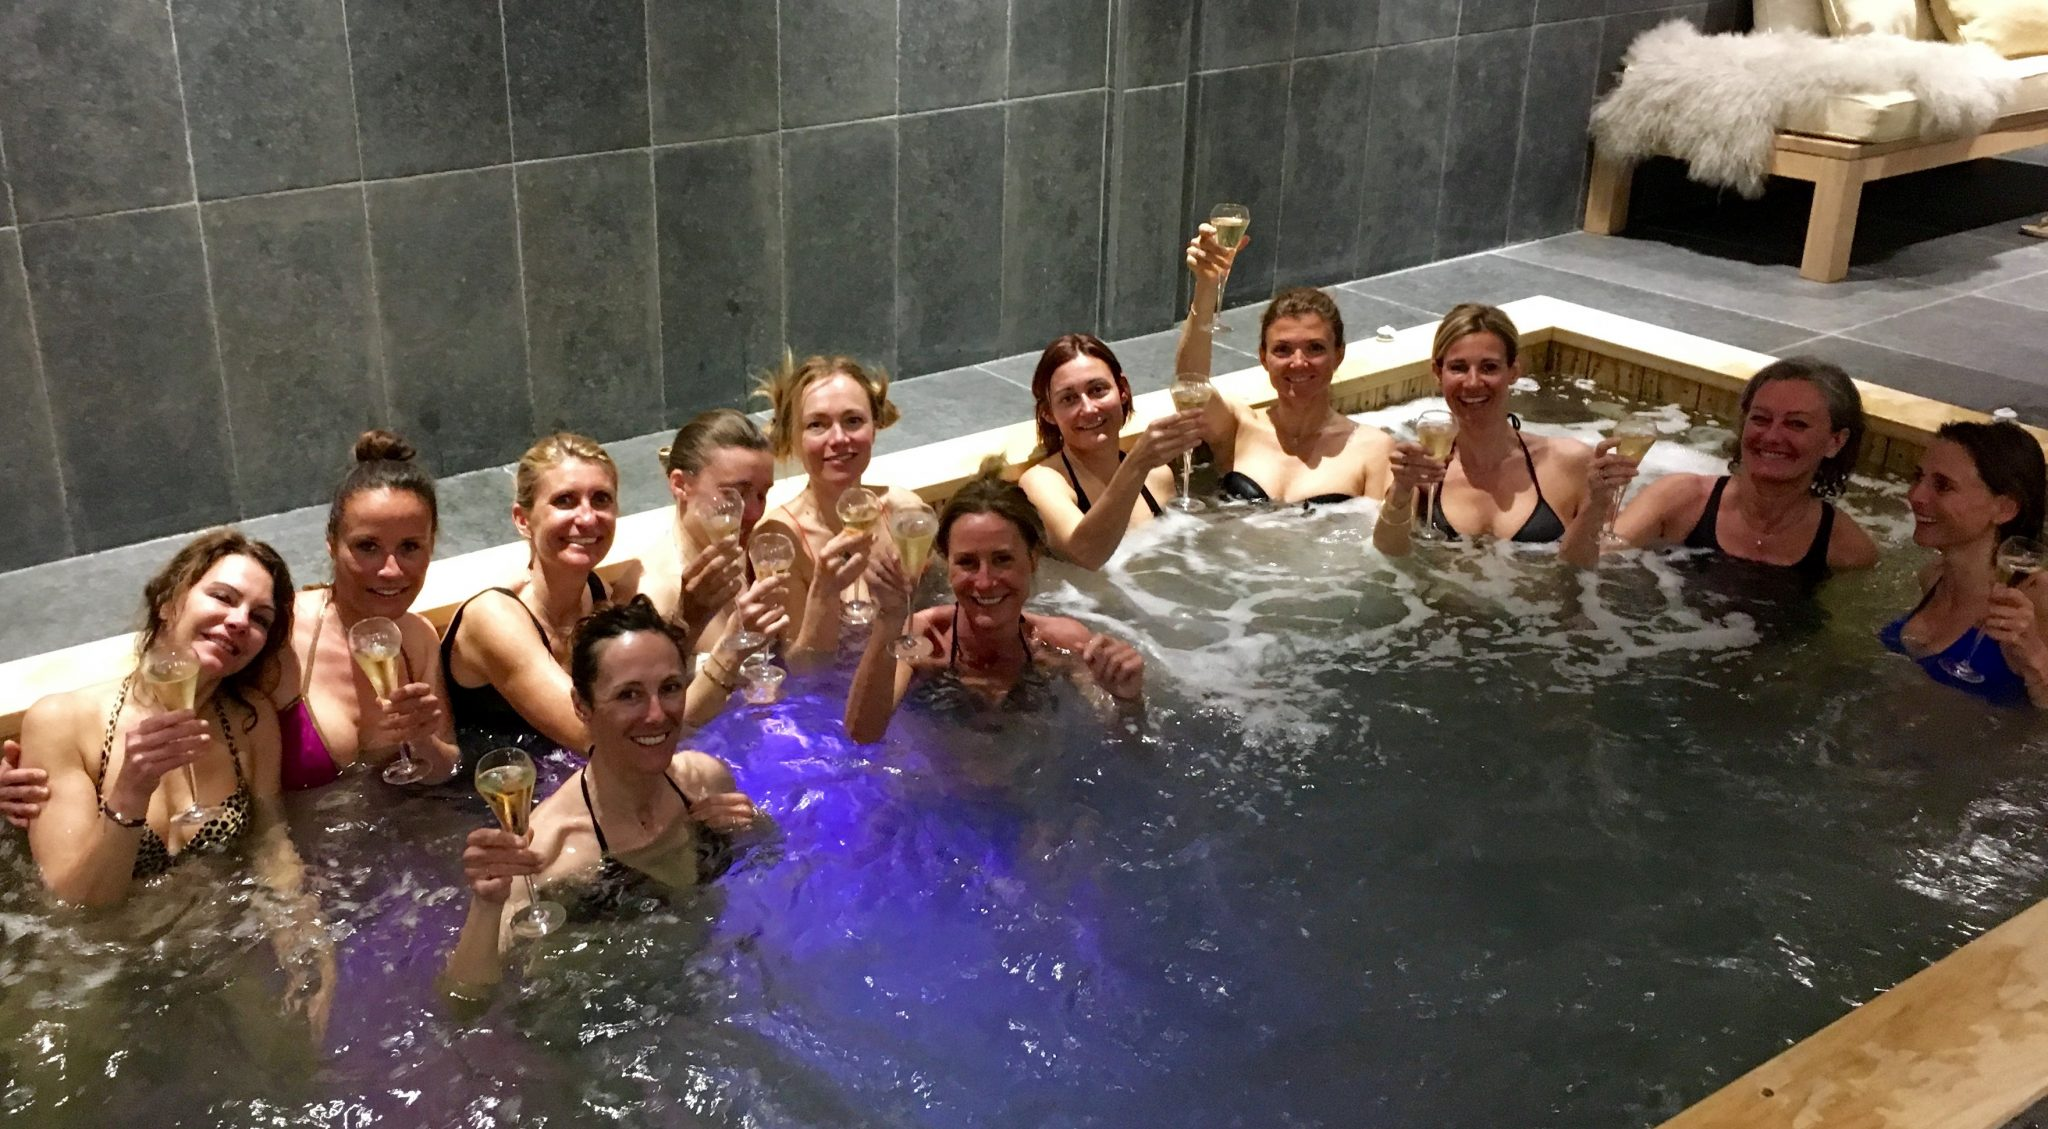 groupe-skieuses-journée-femme-spa